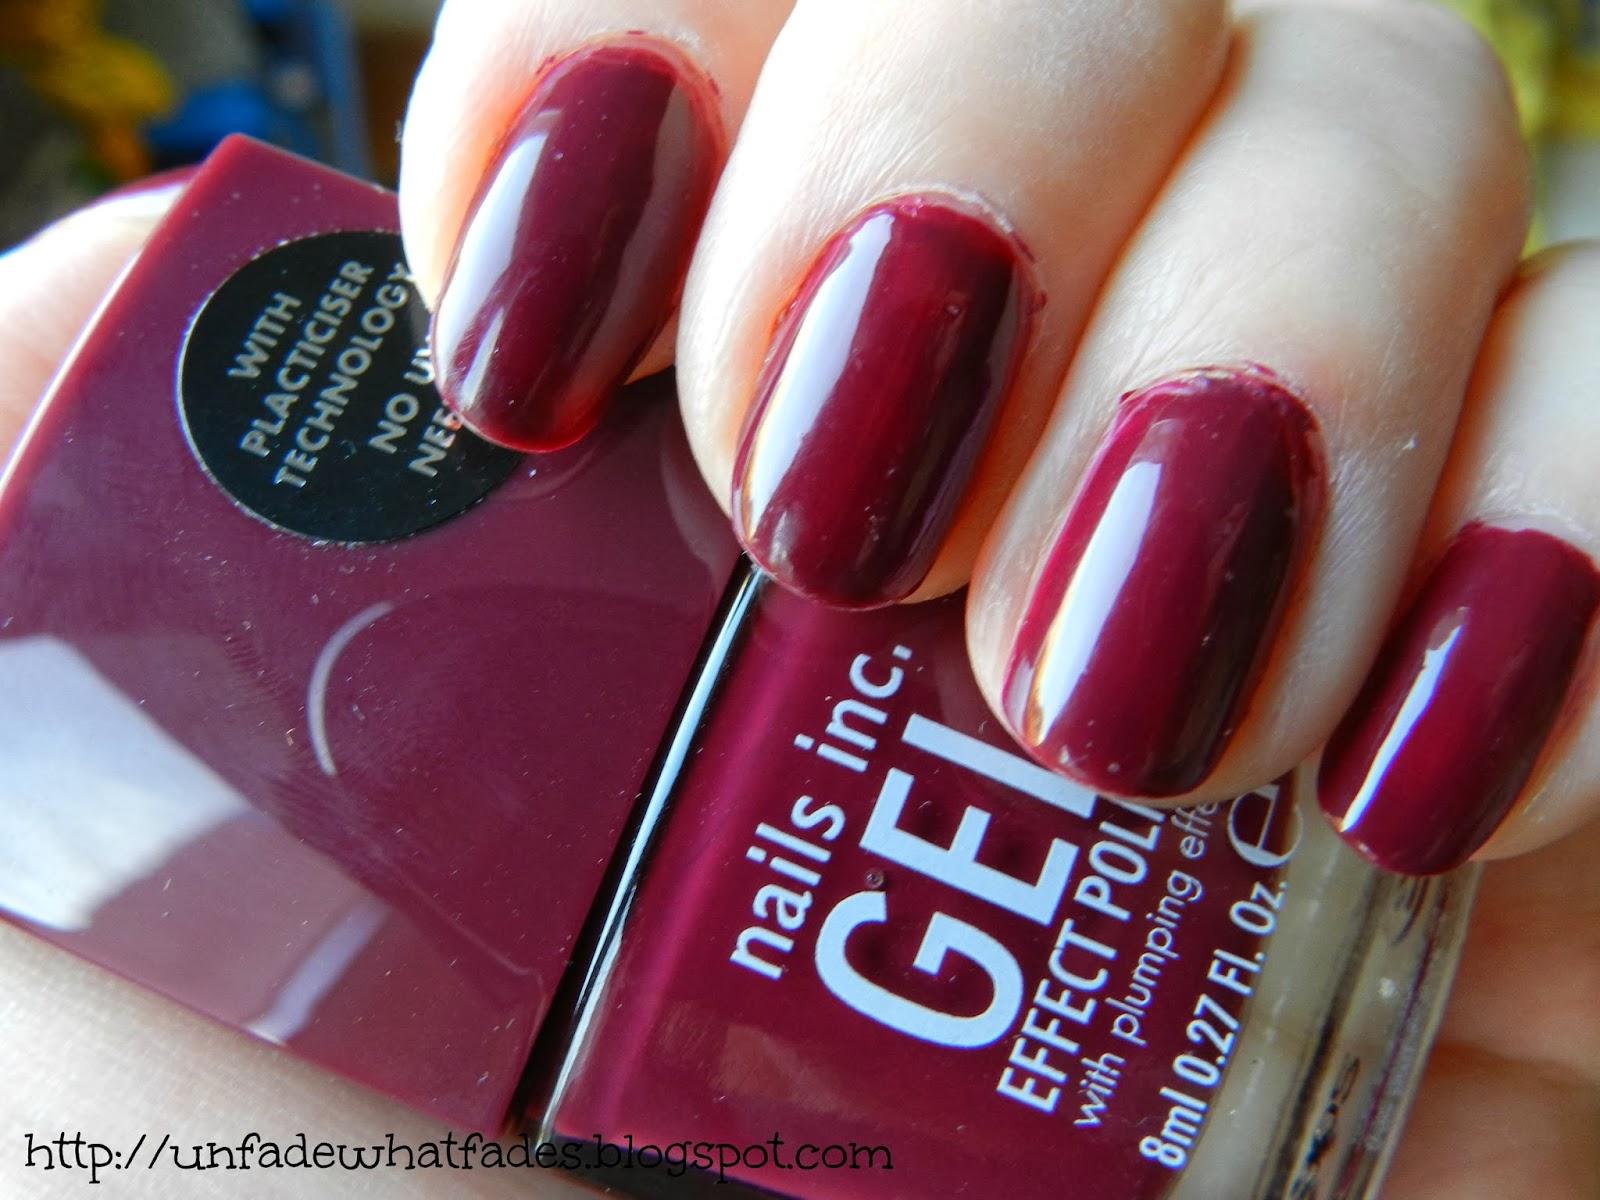 Unfade what fades: Nails Inc gel effect polish in Kensington High ...